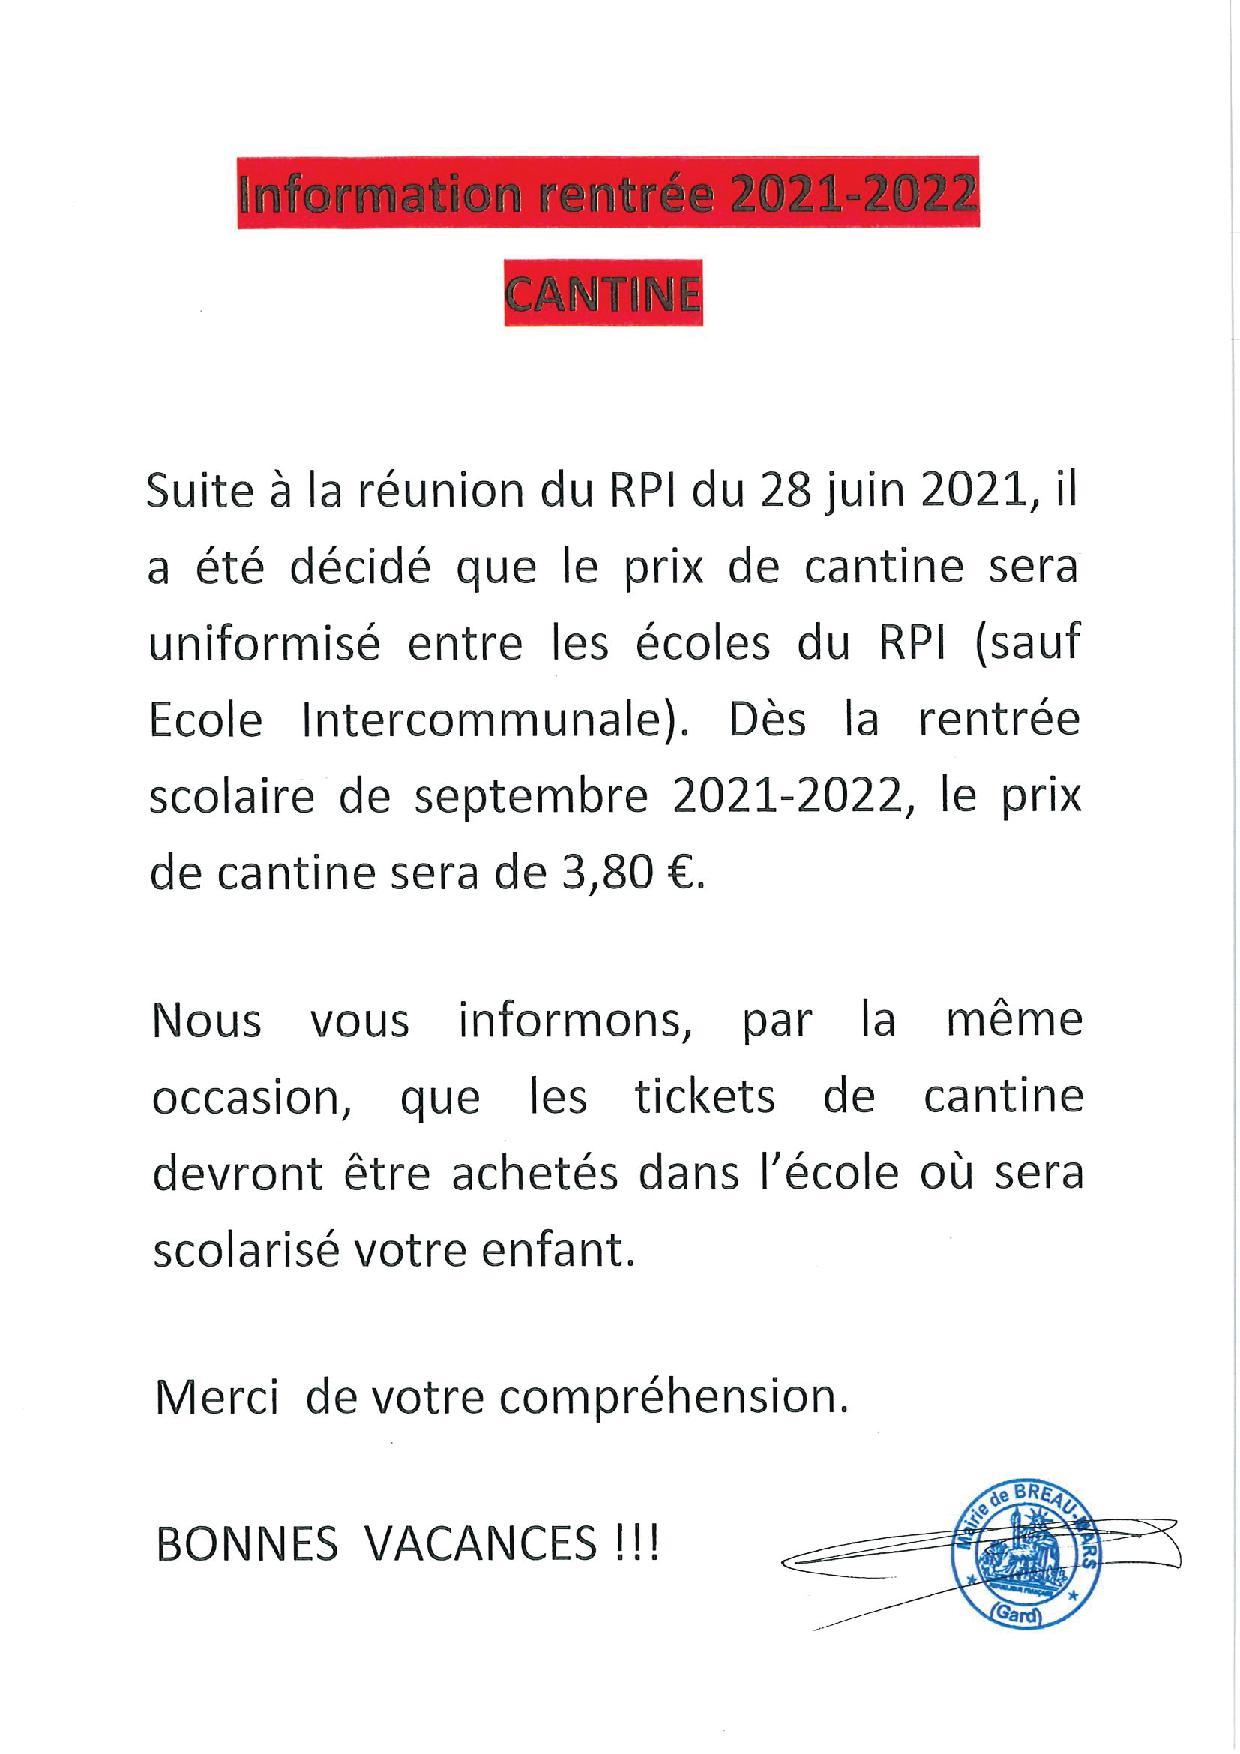 Informations cantine rentrée 2021/2022